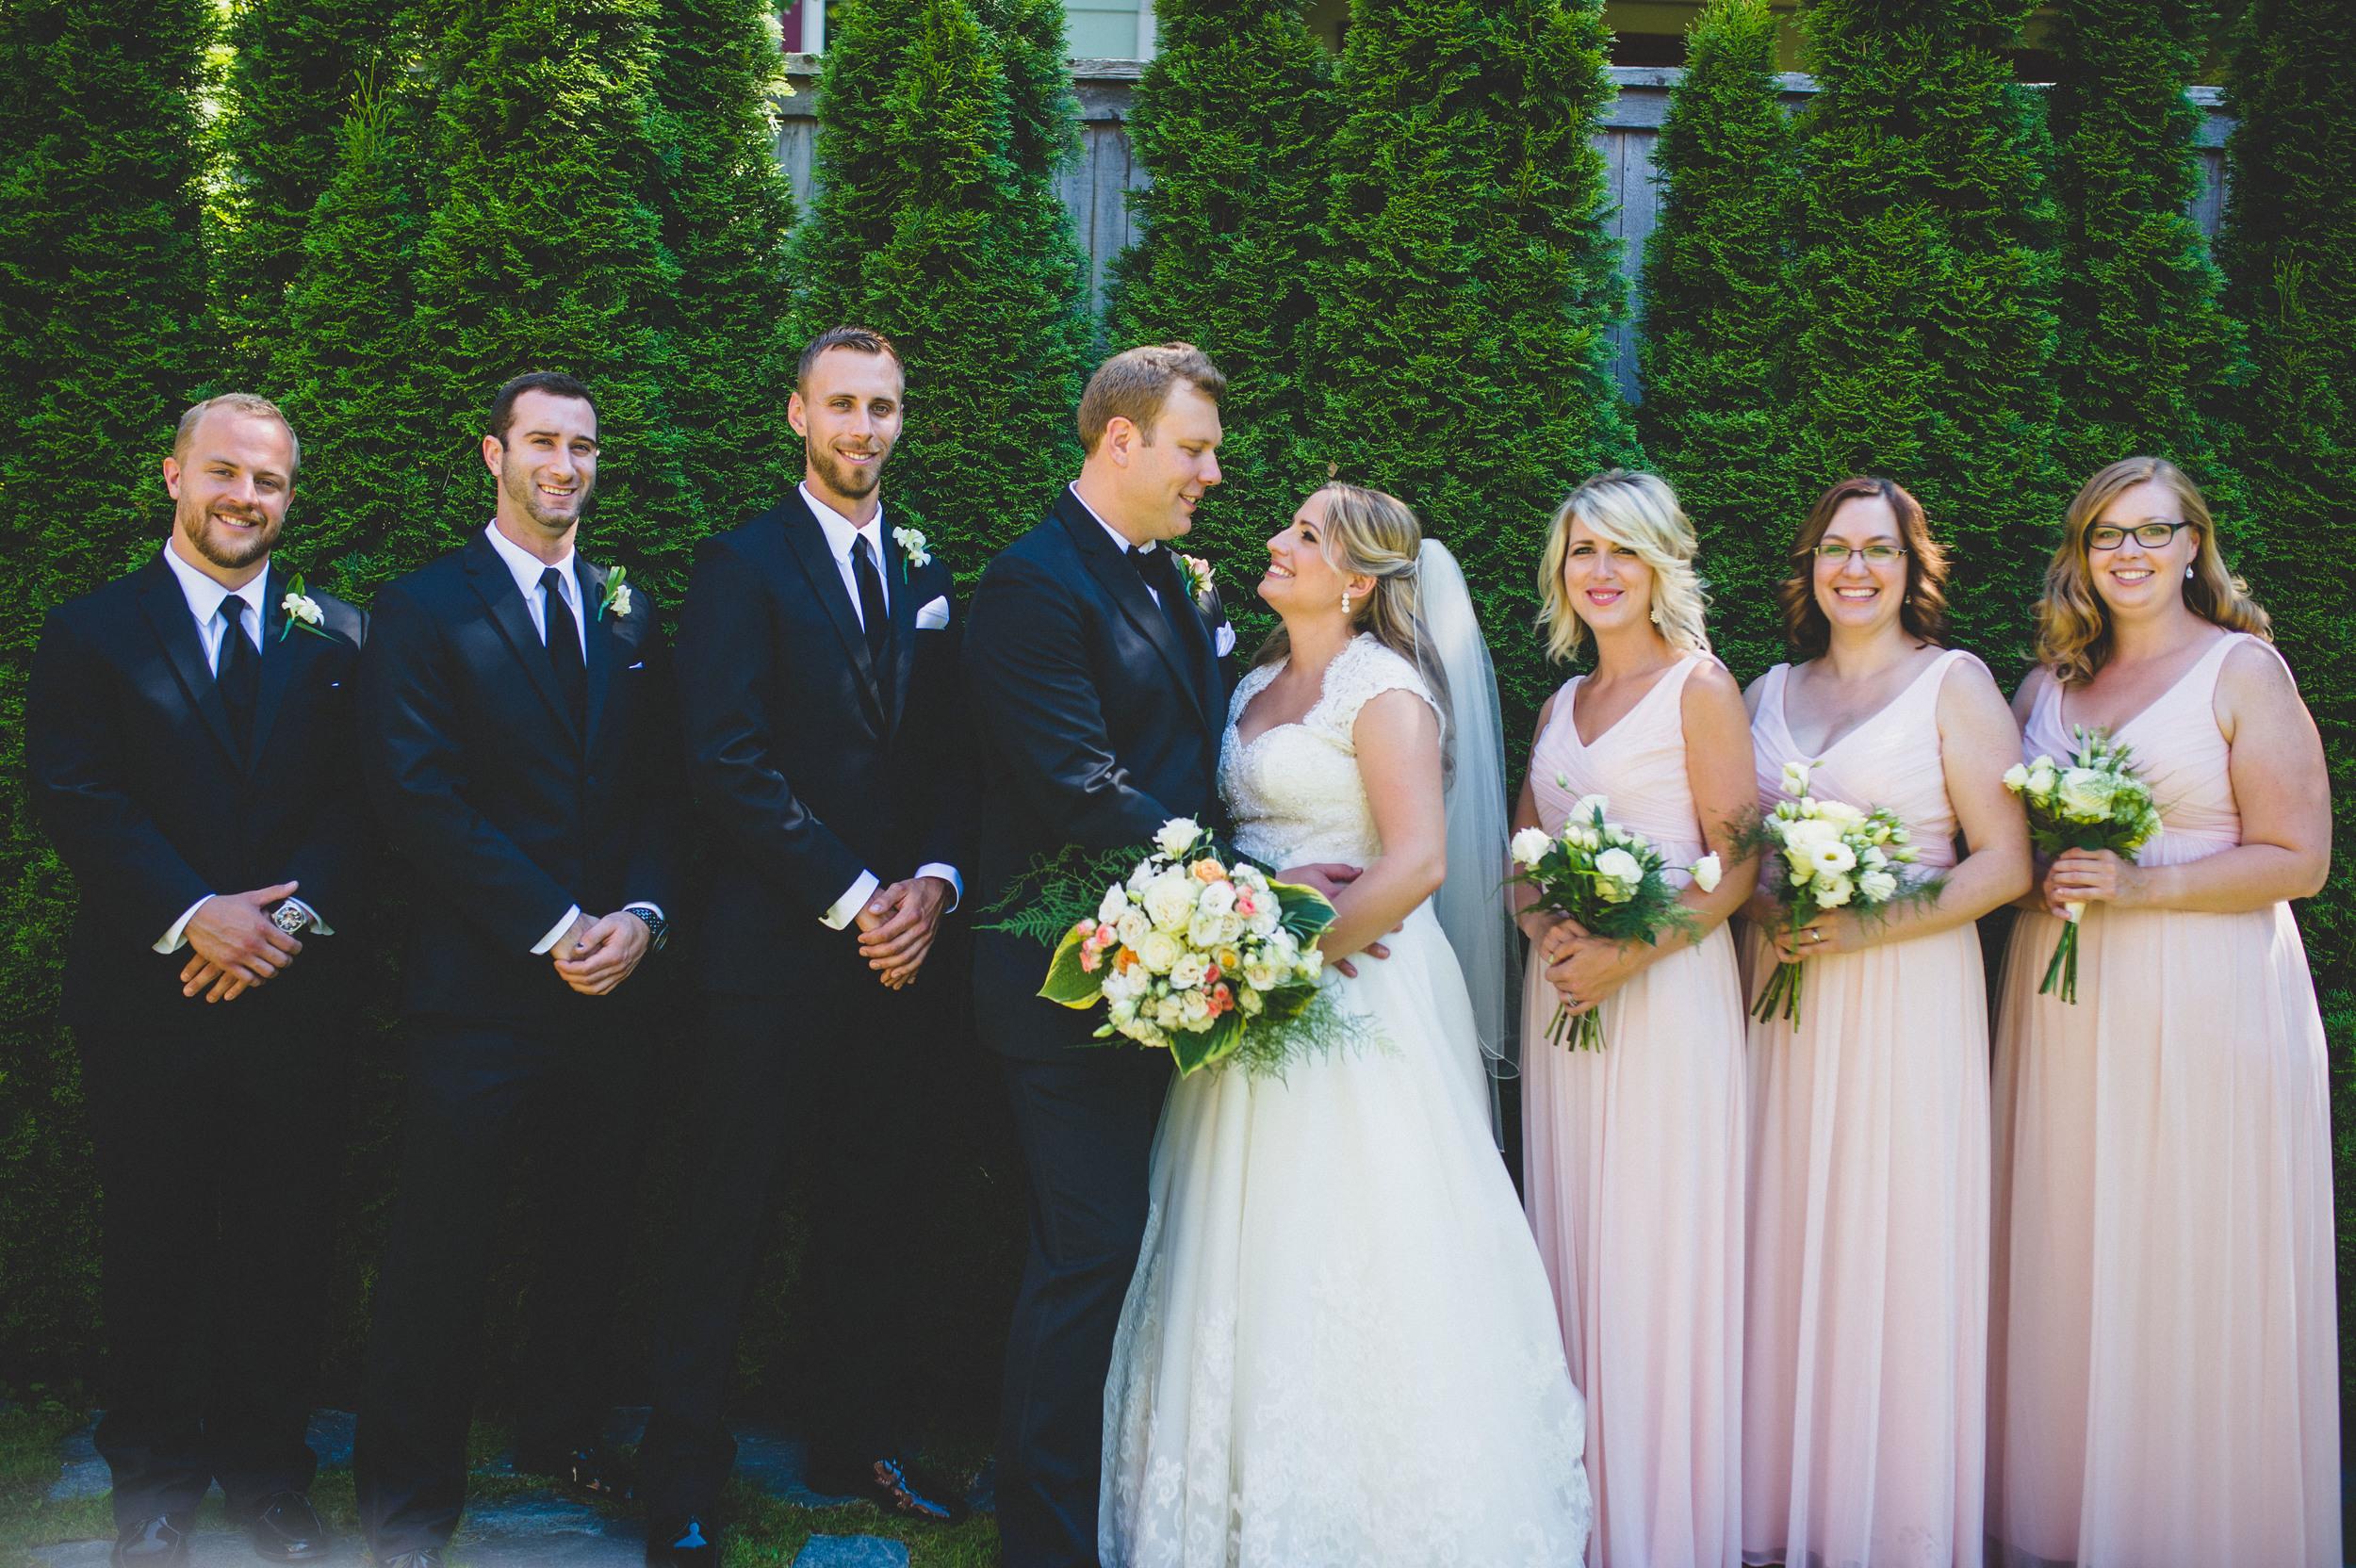 Vancouver St Augustine 's Church wedding photographer edward lai photography-58.jpg